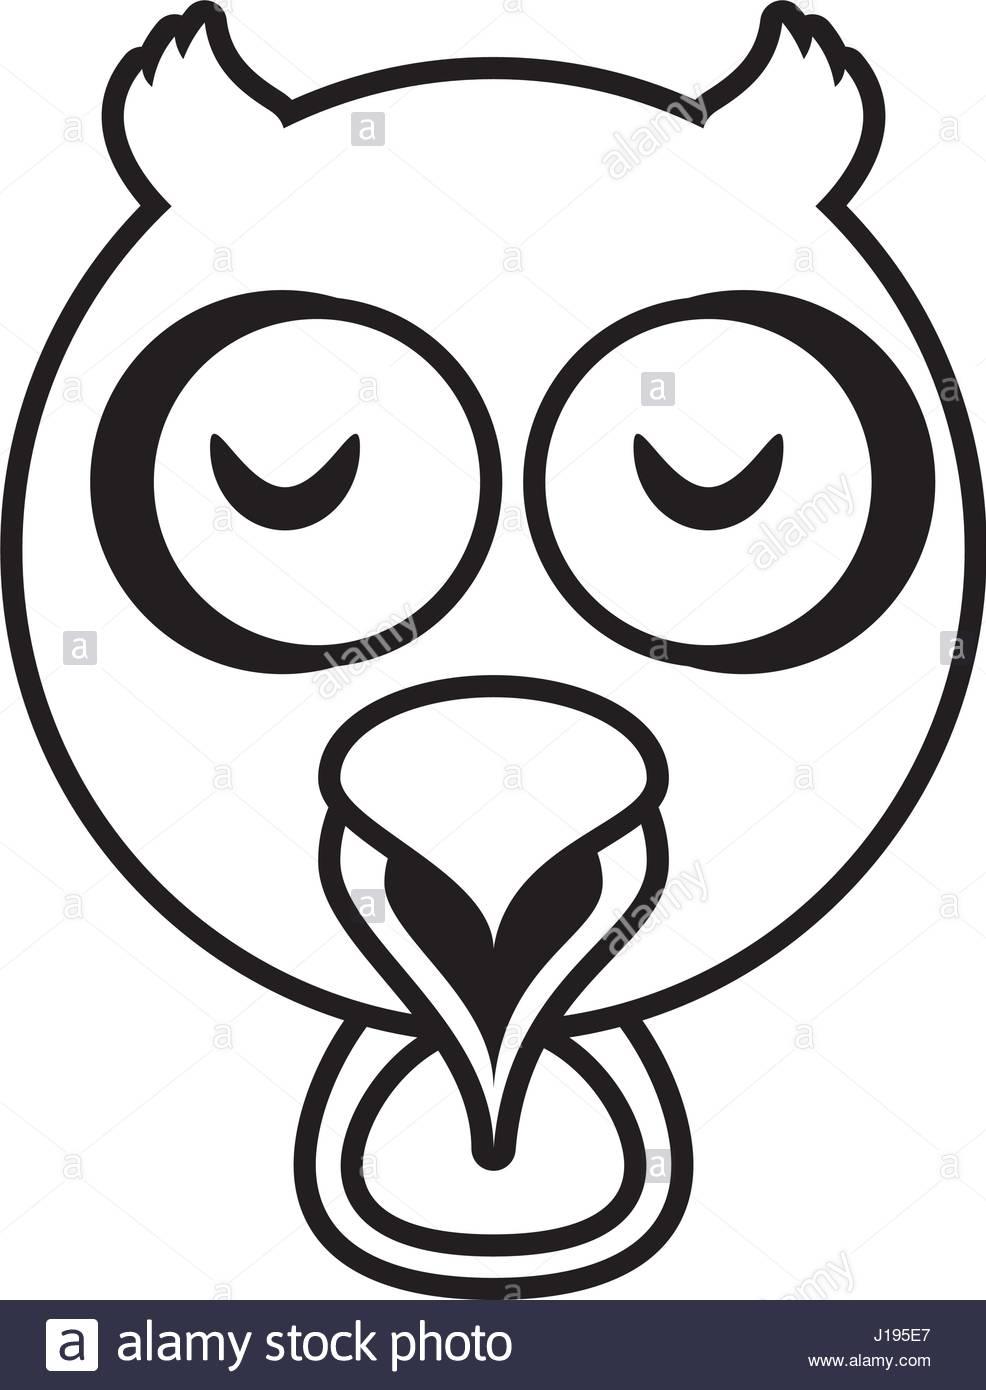 986x1390 Outline Owl Head Animal Stock Vector Art Amp Illustration, Vector